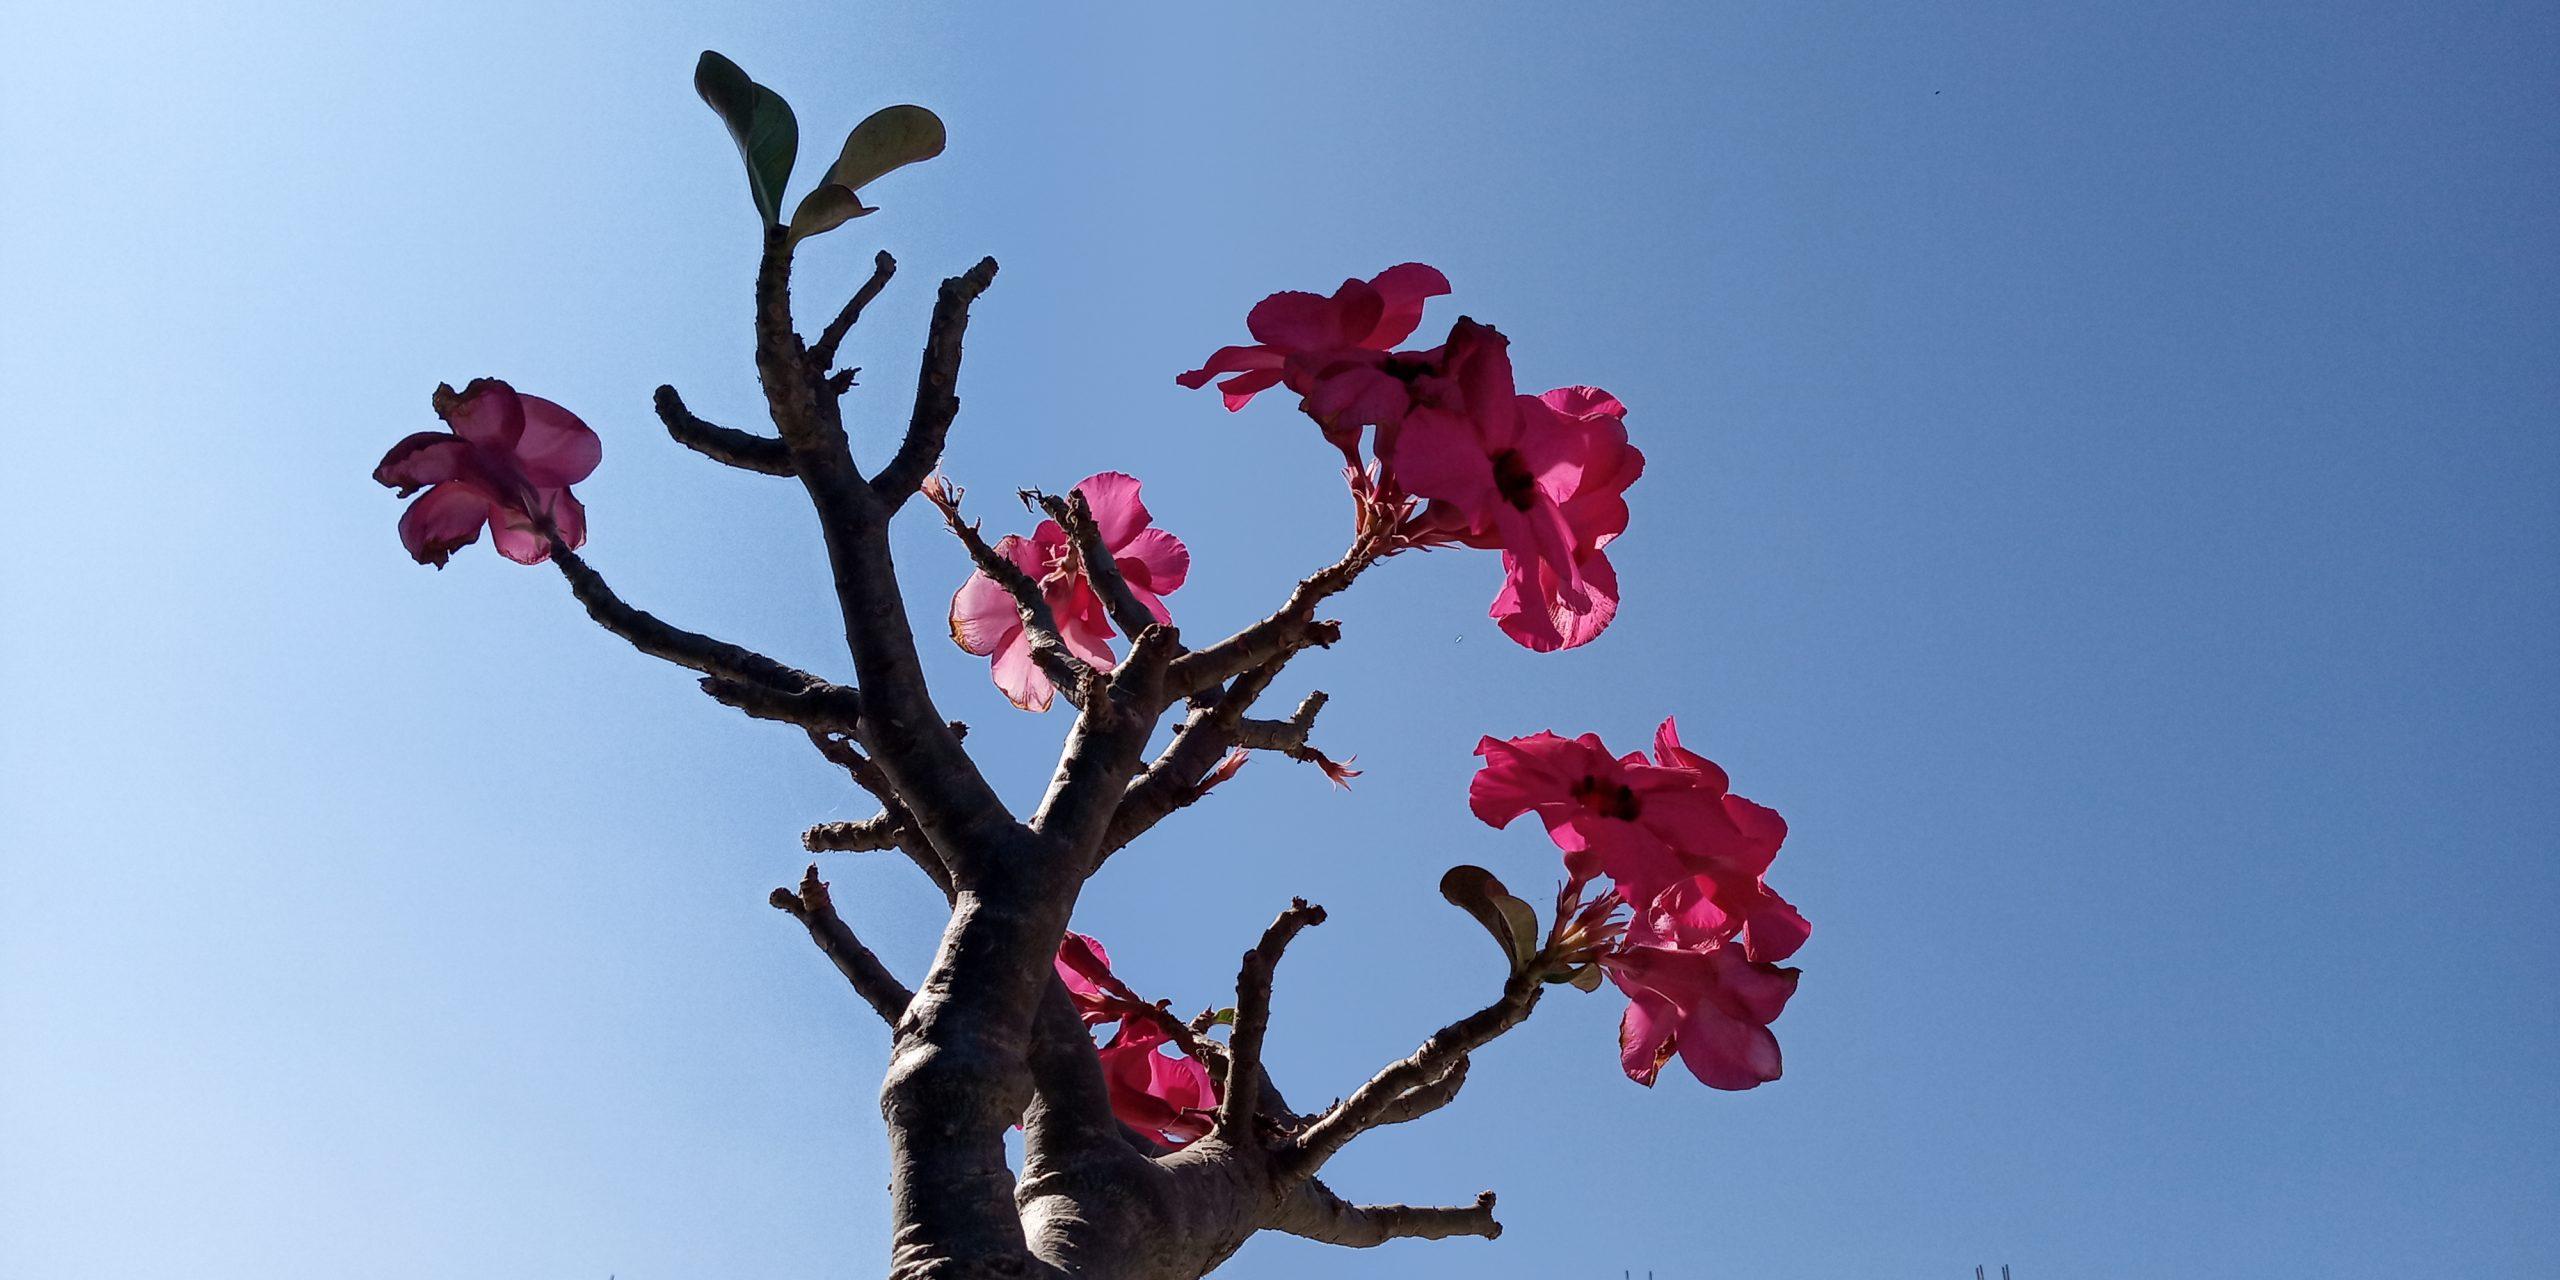 Adenium pink flower plant